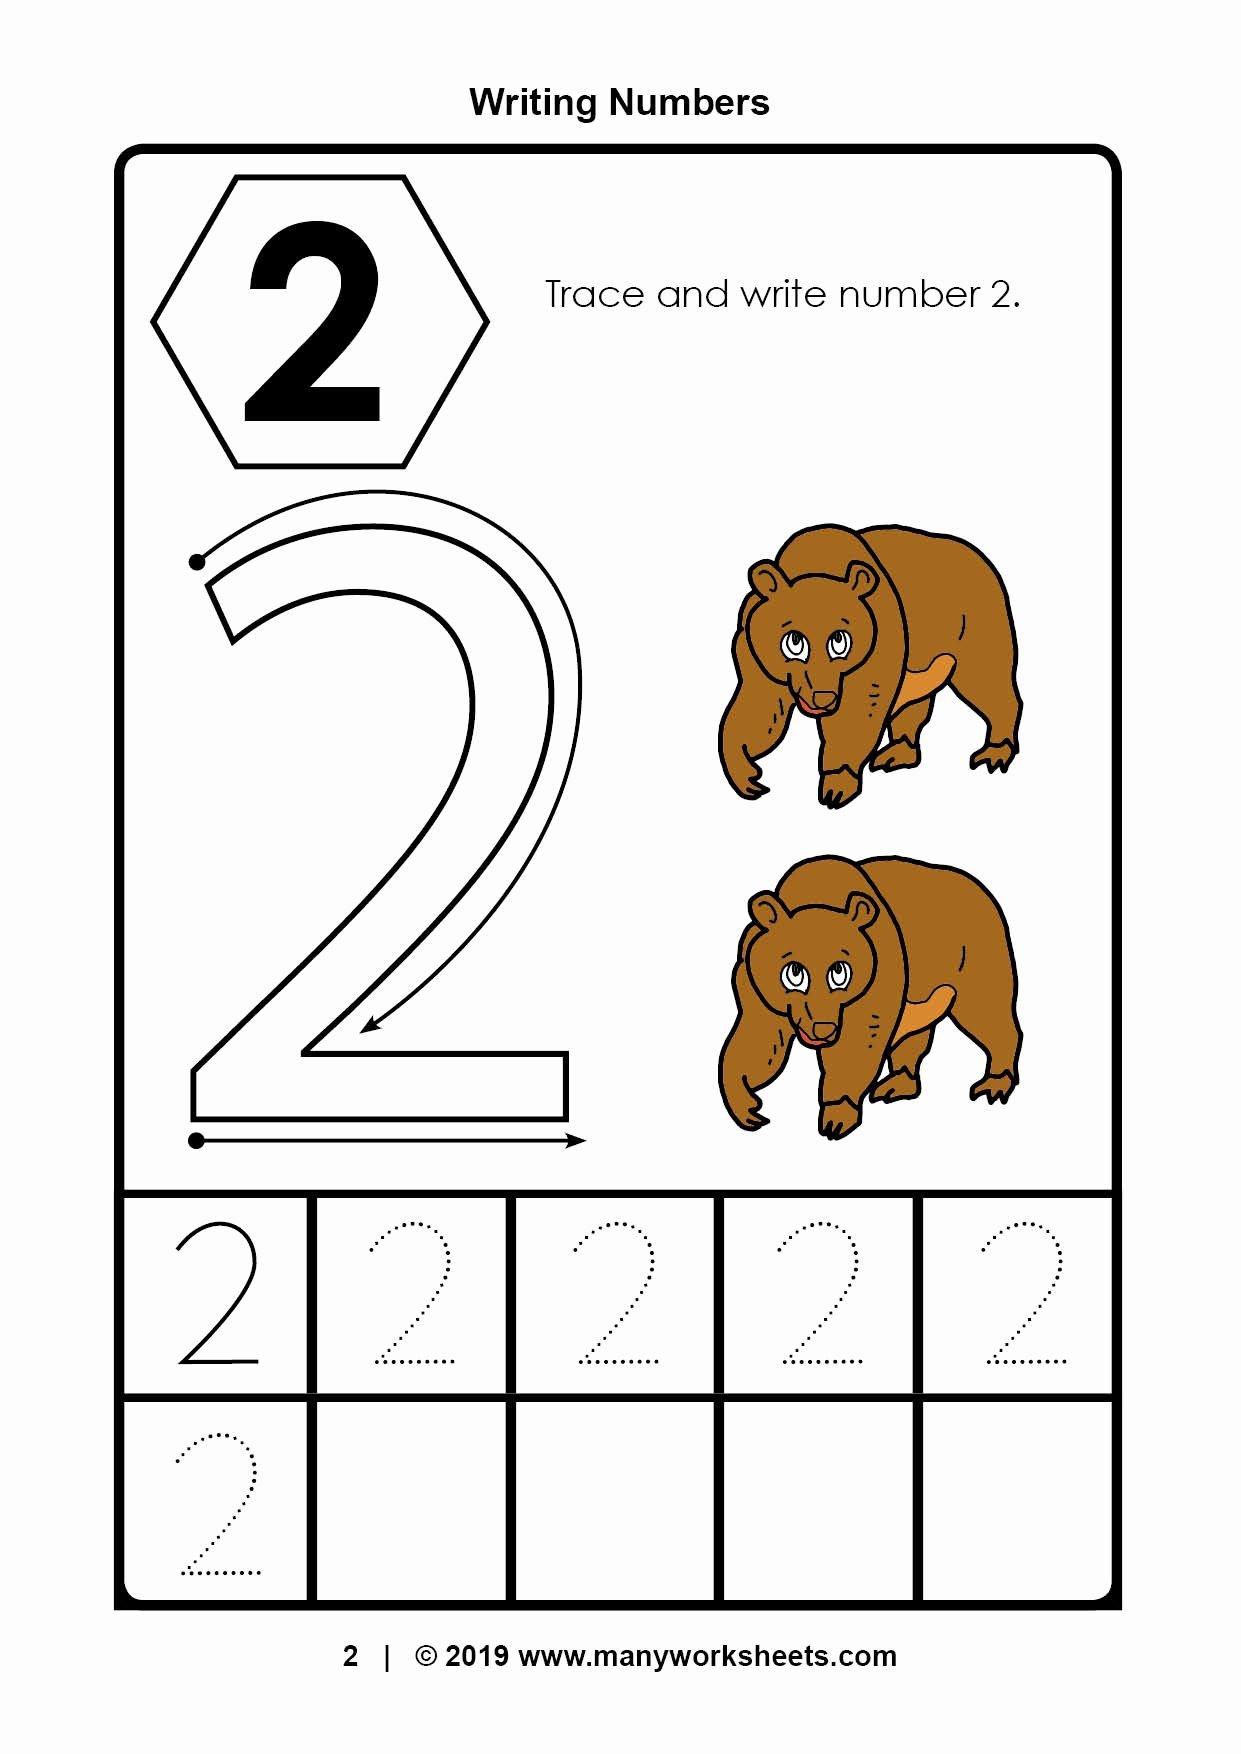 Number 2 Worksheets for Preschoolers Printable Tracing Number Worksheets for Kindergarten Preschool Ratio